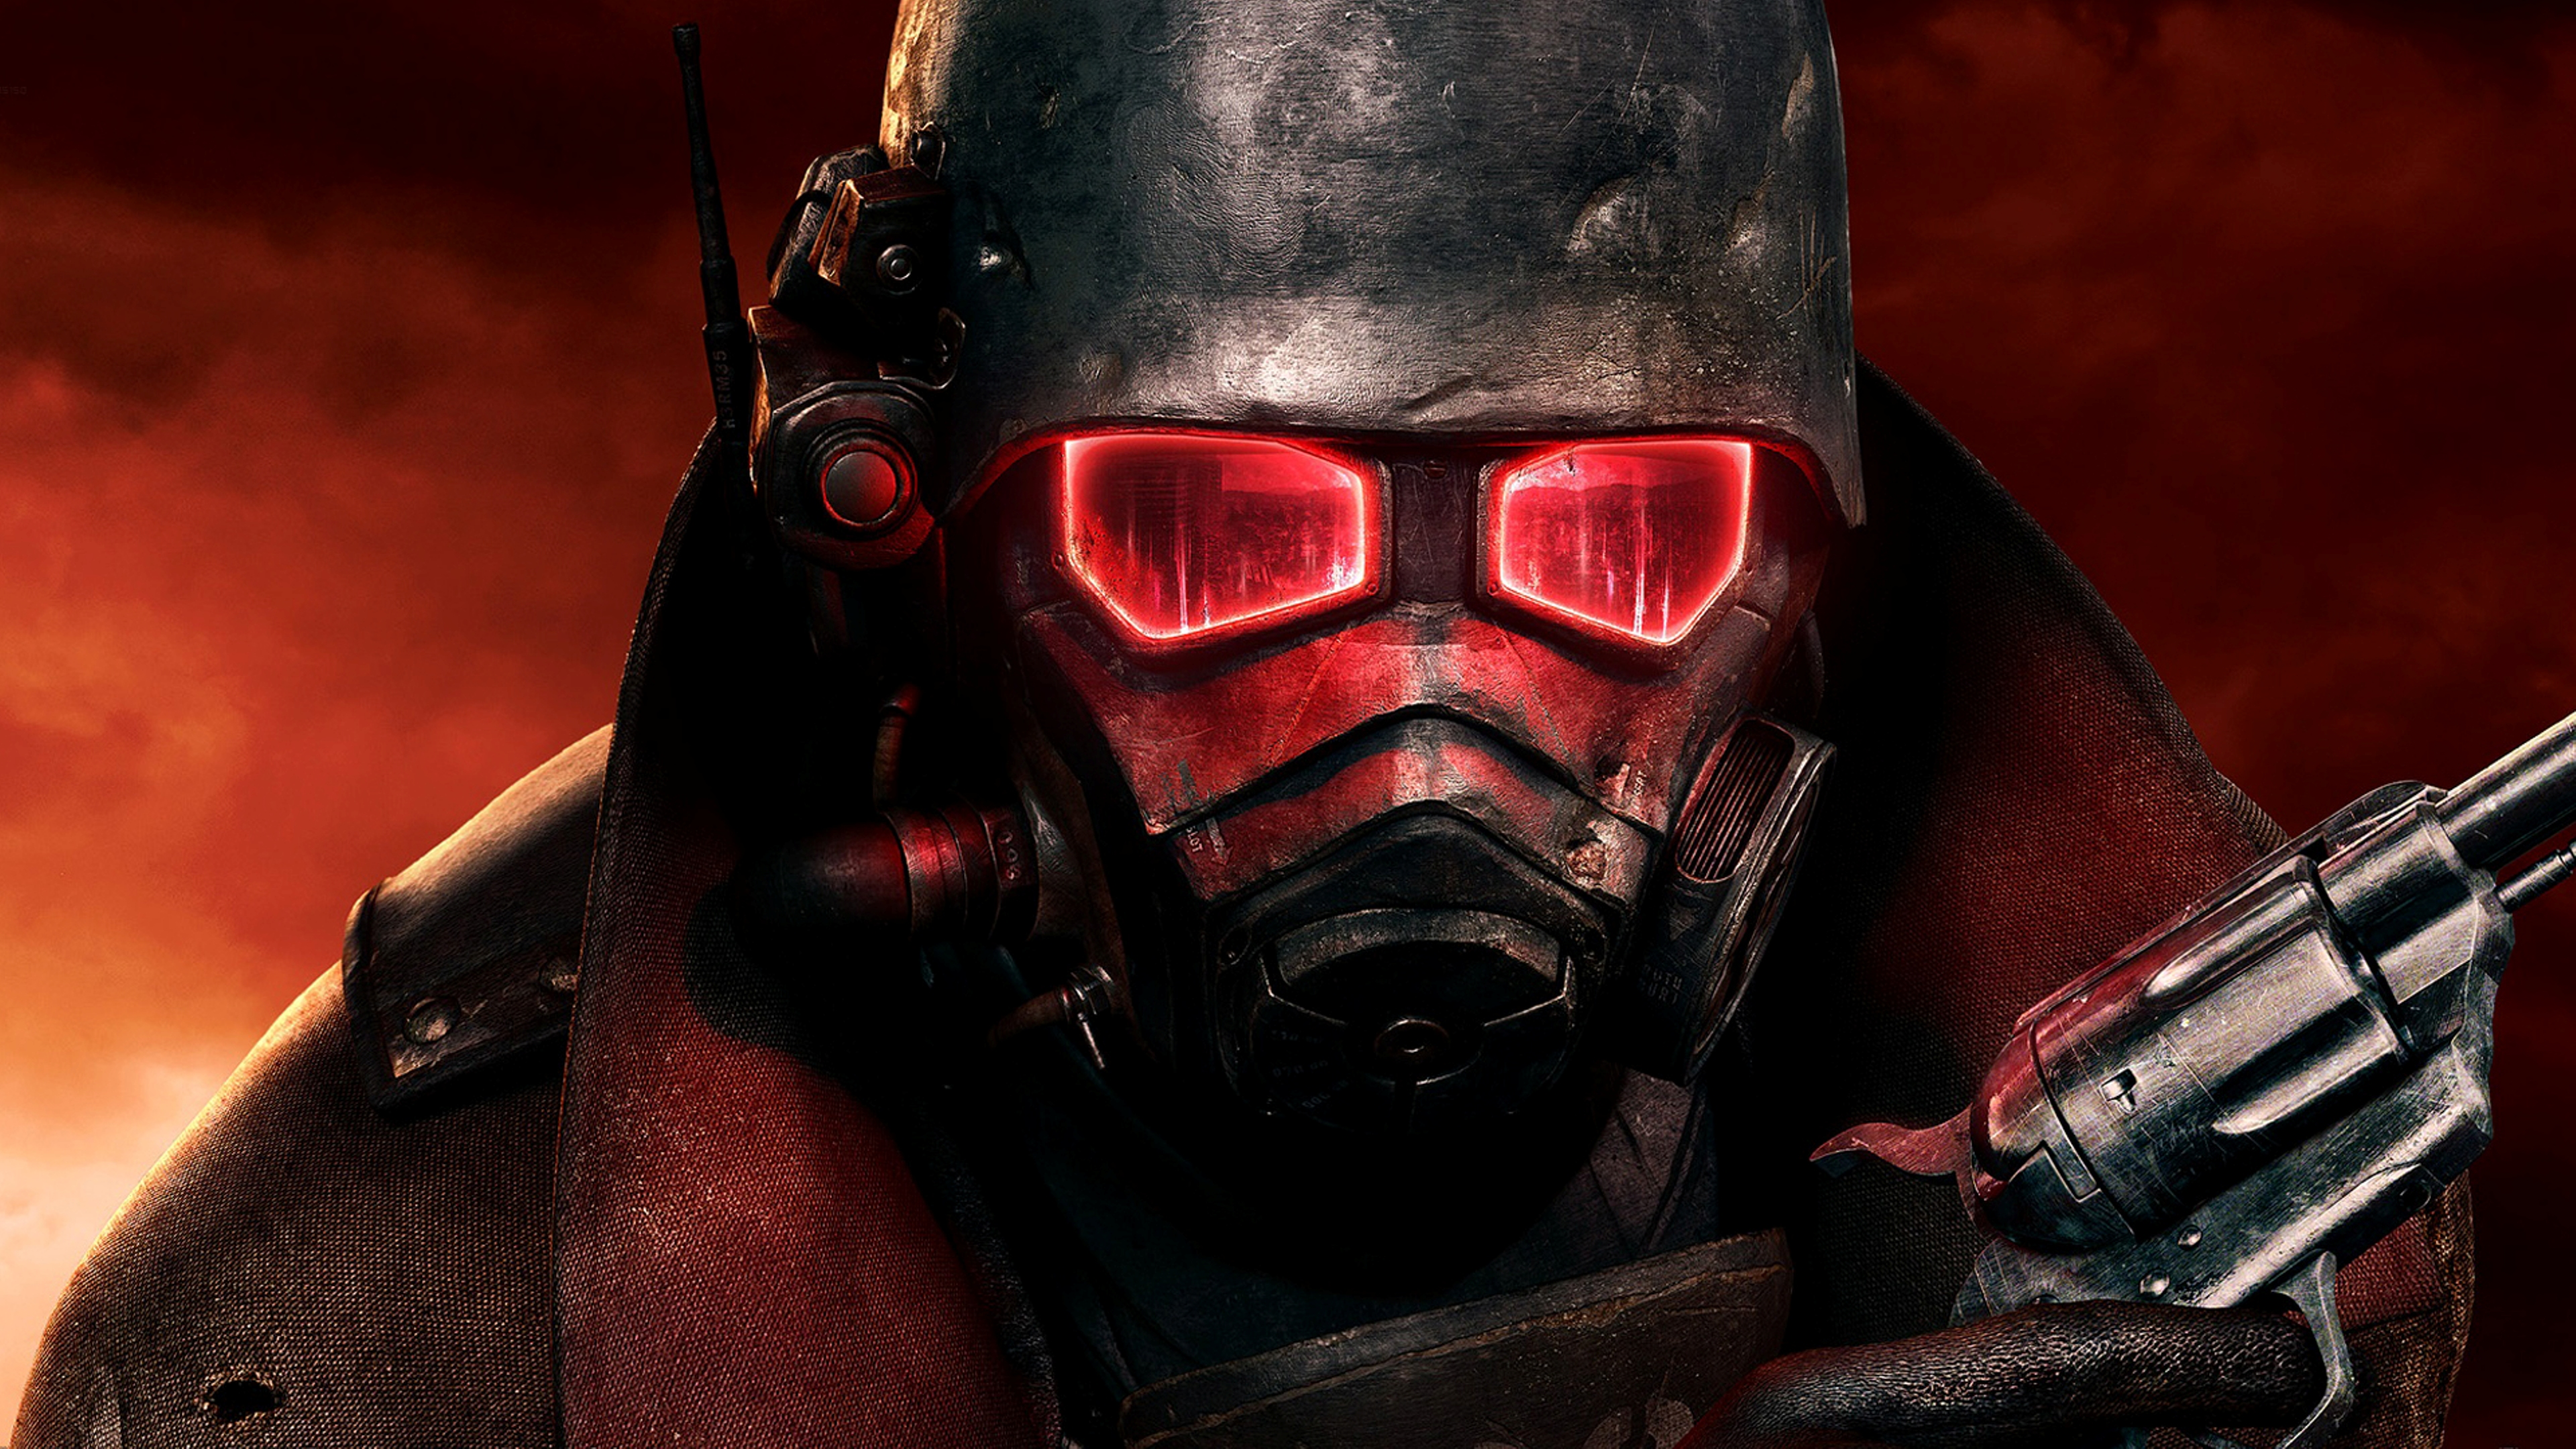 Fallout wallpaper background 3840x2160